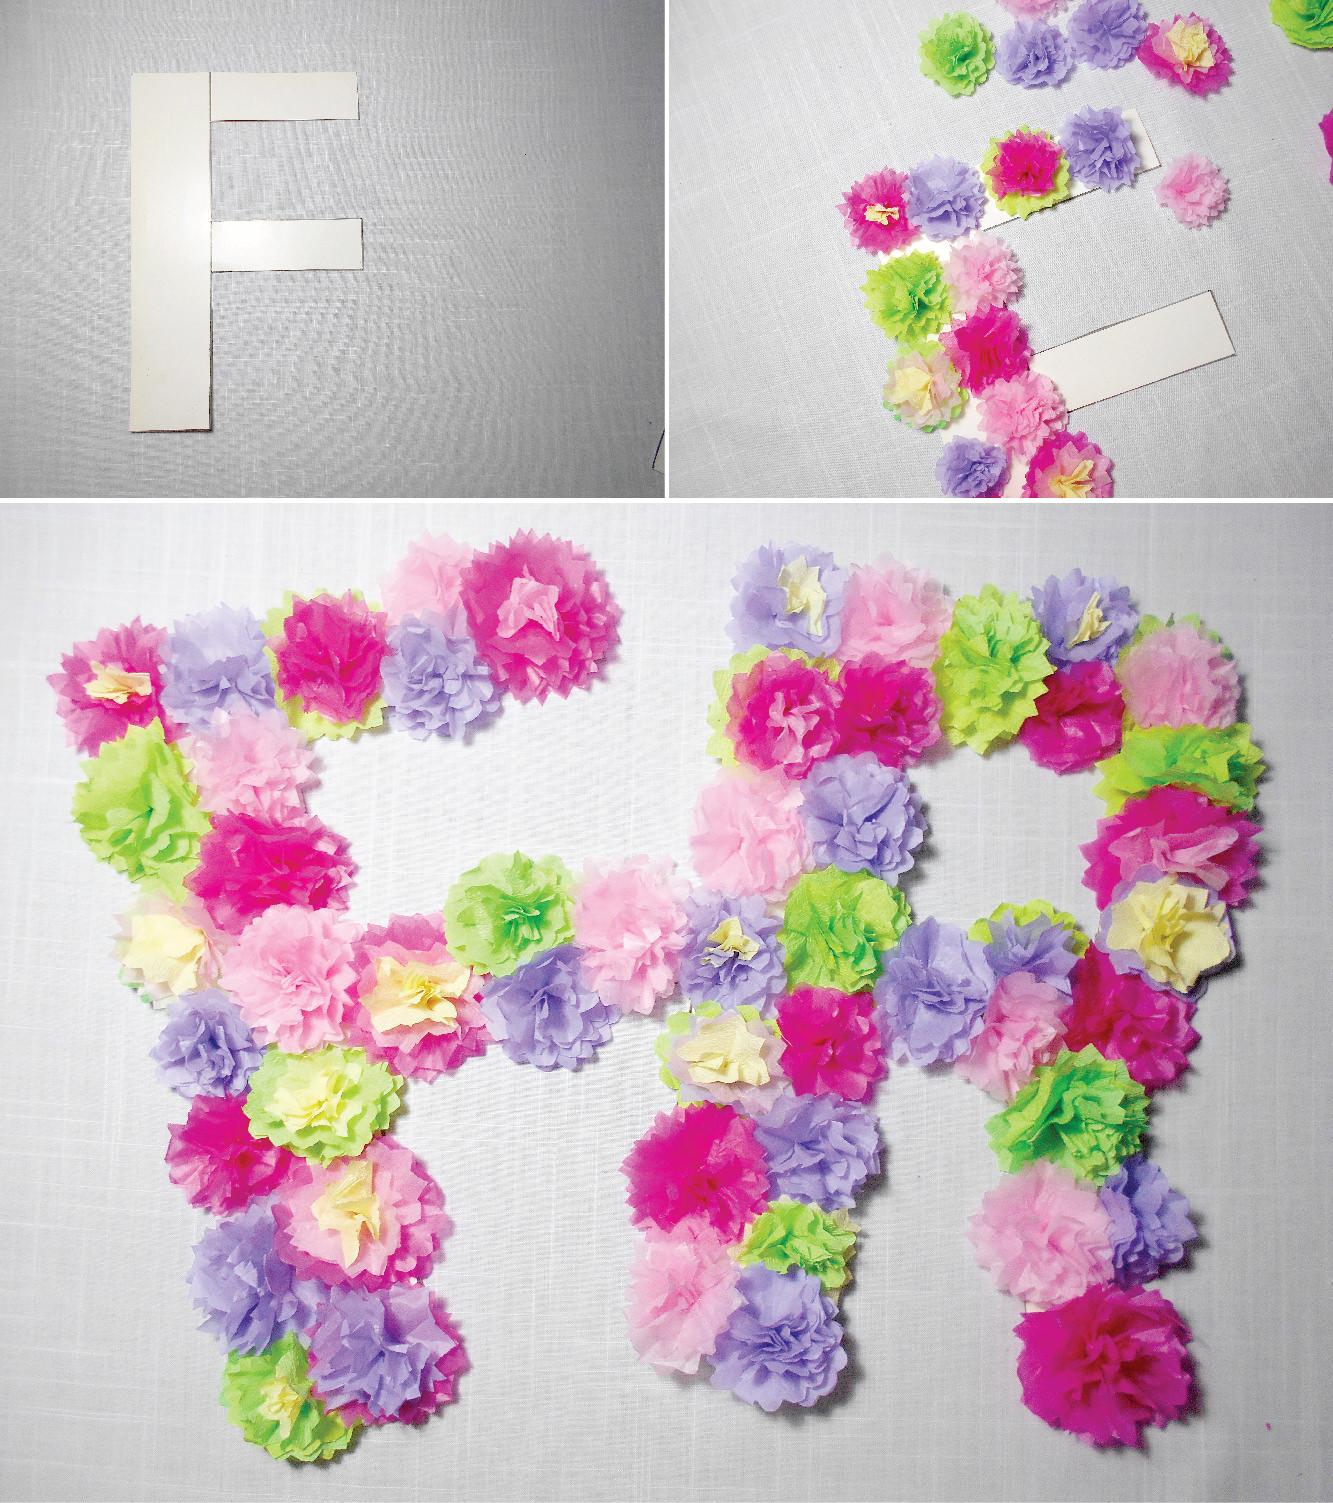 Diy Paper Flowers And Butterflies Wall Art Room Decoration Idea